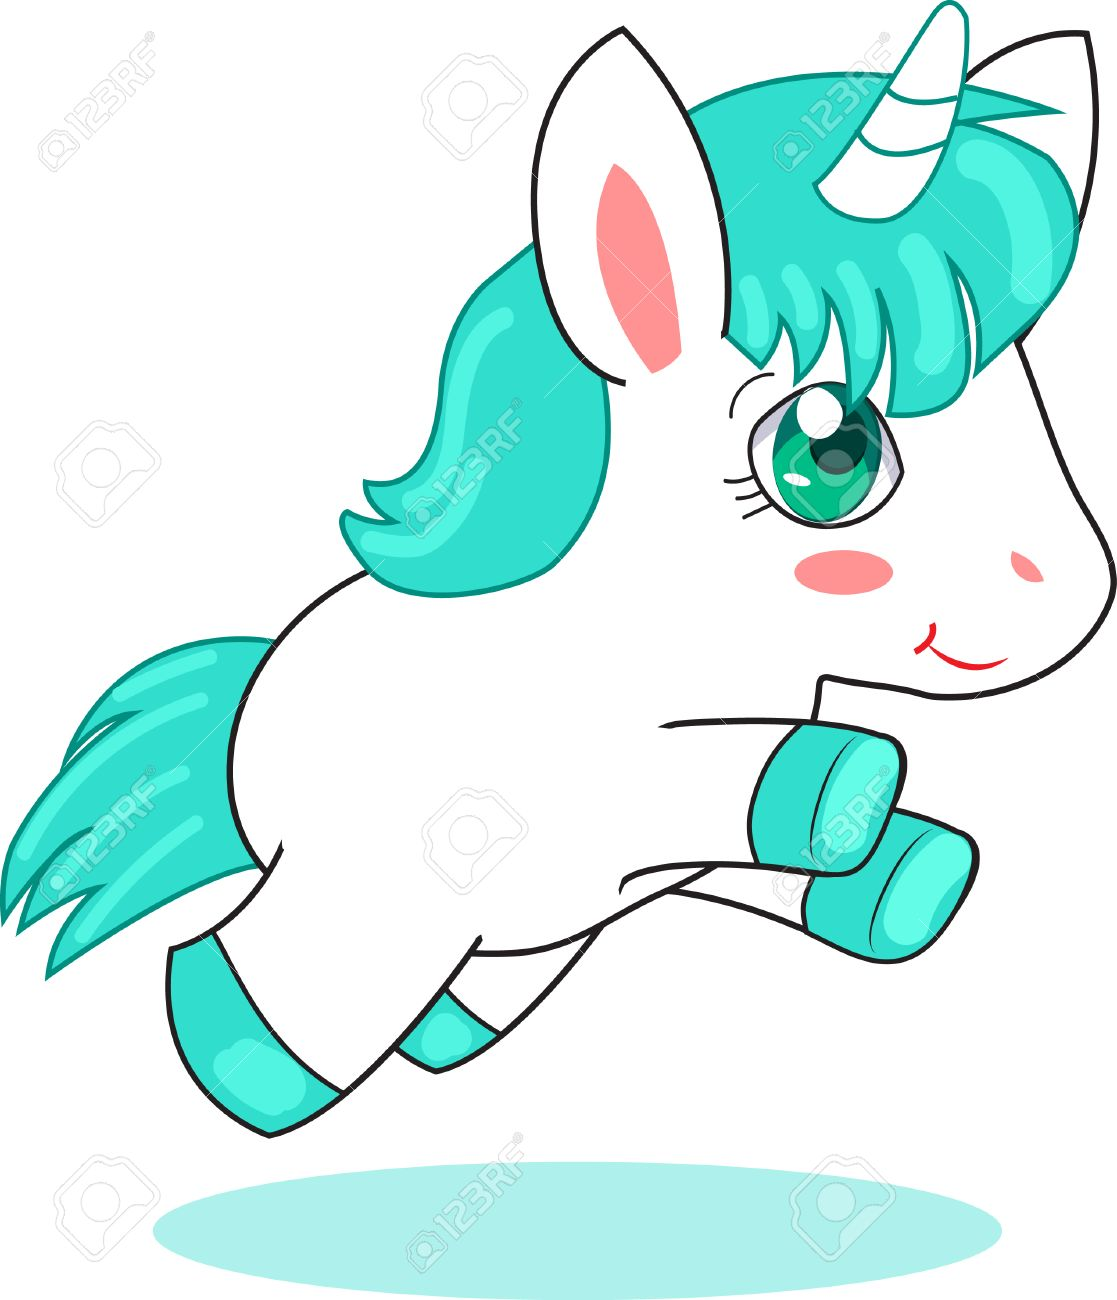 1117x1300 Cute Unicorn Pegasus. Vector Illustration On A White Background